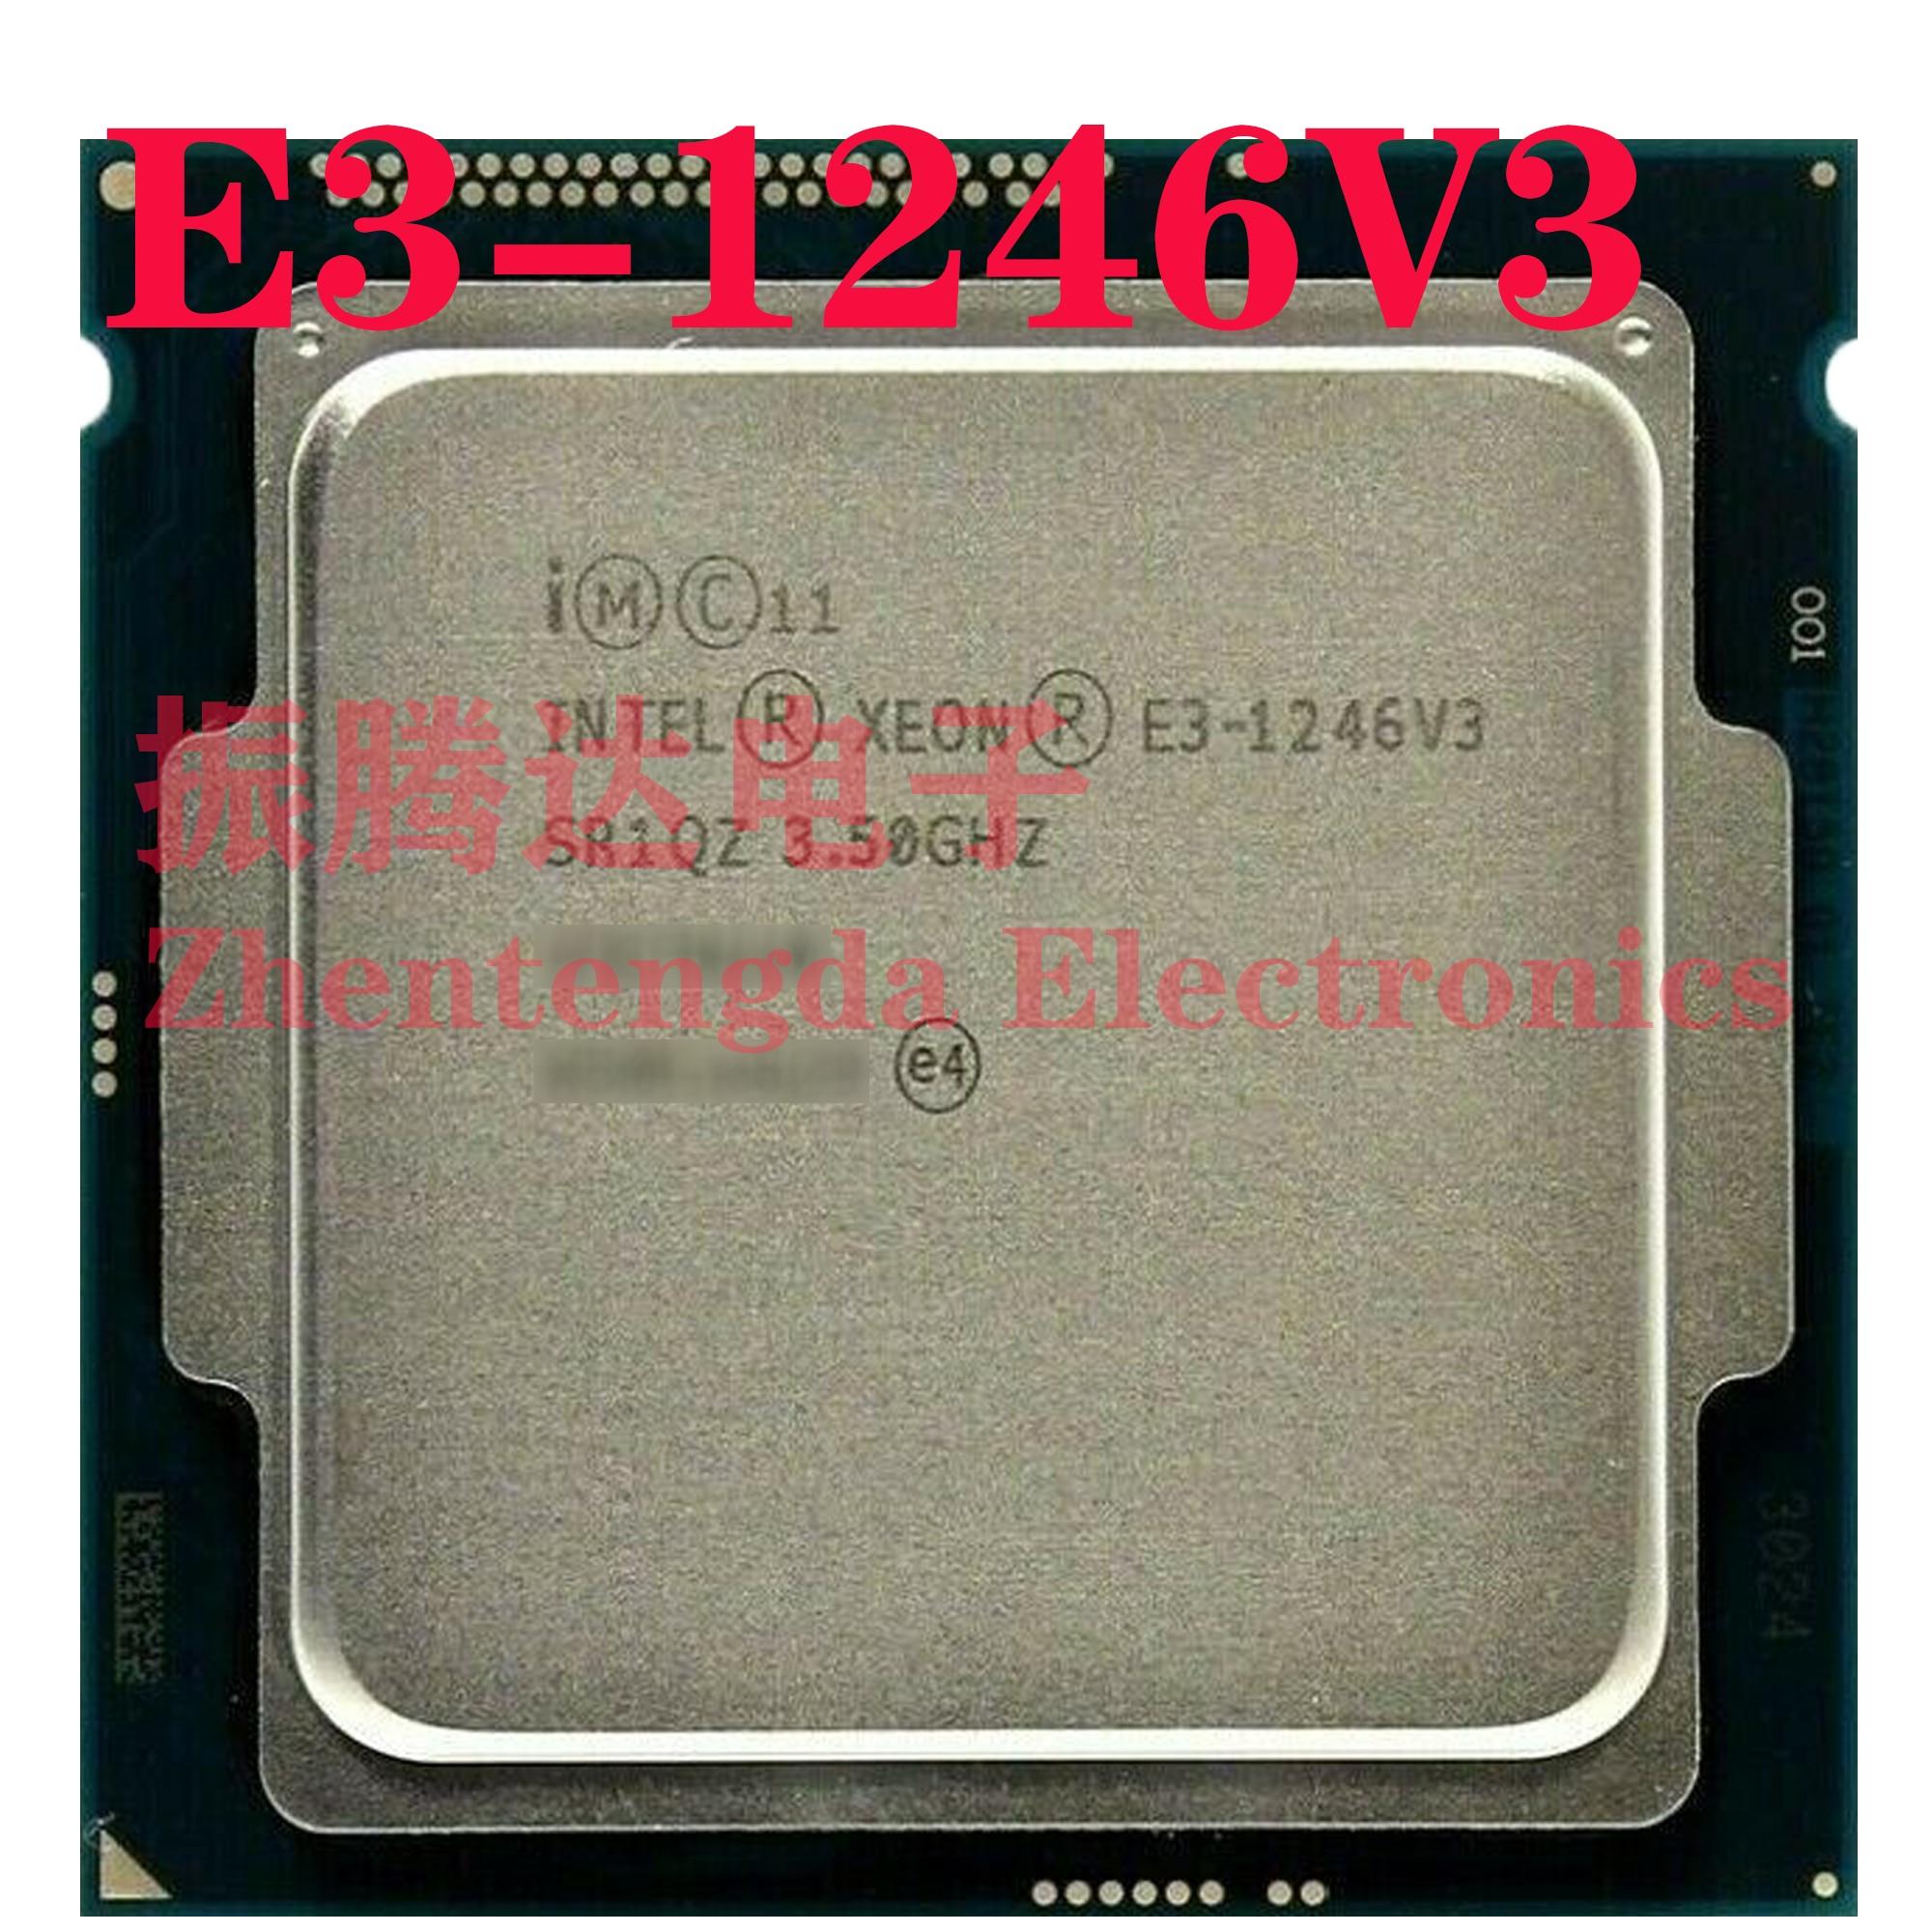 Intel Xeon E3-1246 v3 3.5GHz 8MB 4 Core 8 Thread LGA-1150 E3-1246V3 CPU Processor